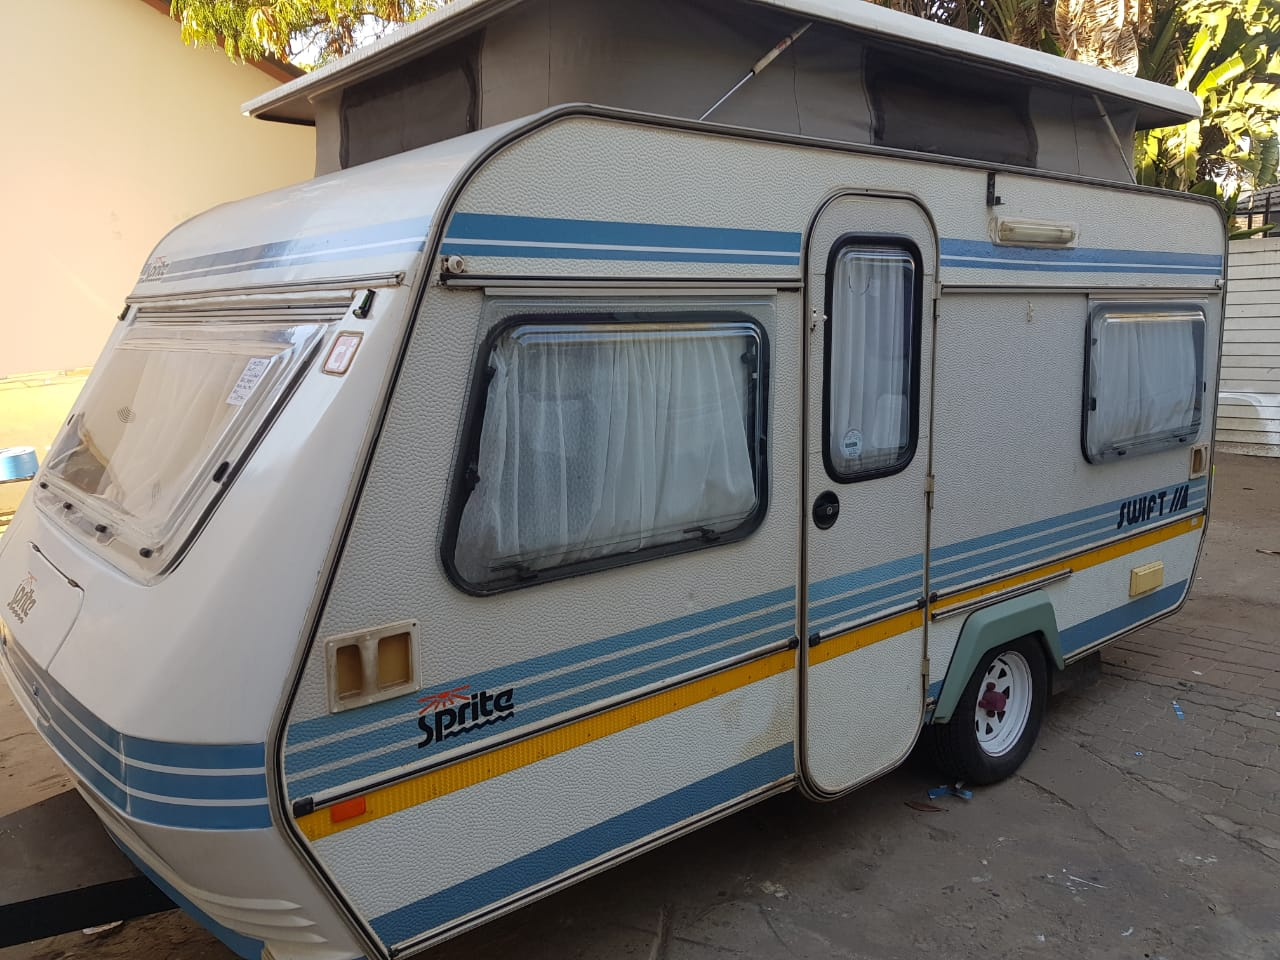 Sprite Swift caravan,lightweight 680kg tare | Junk Mail